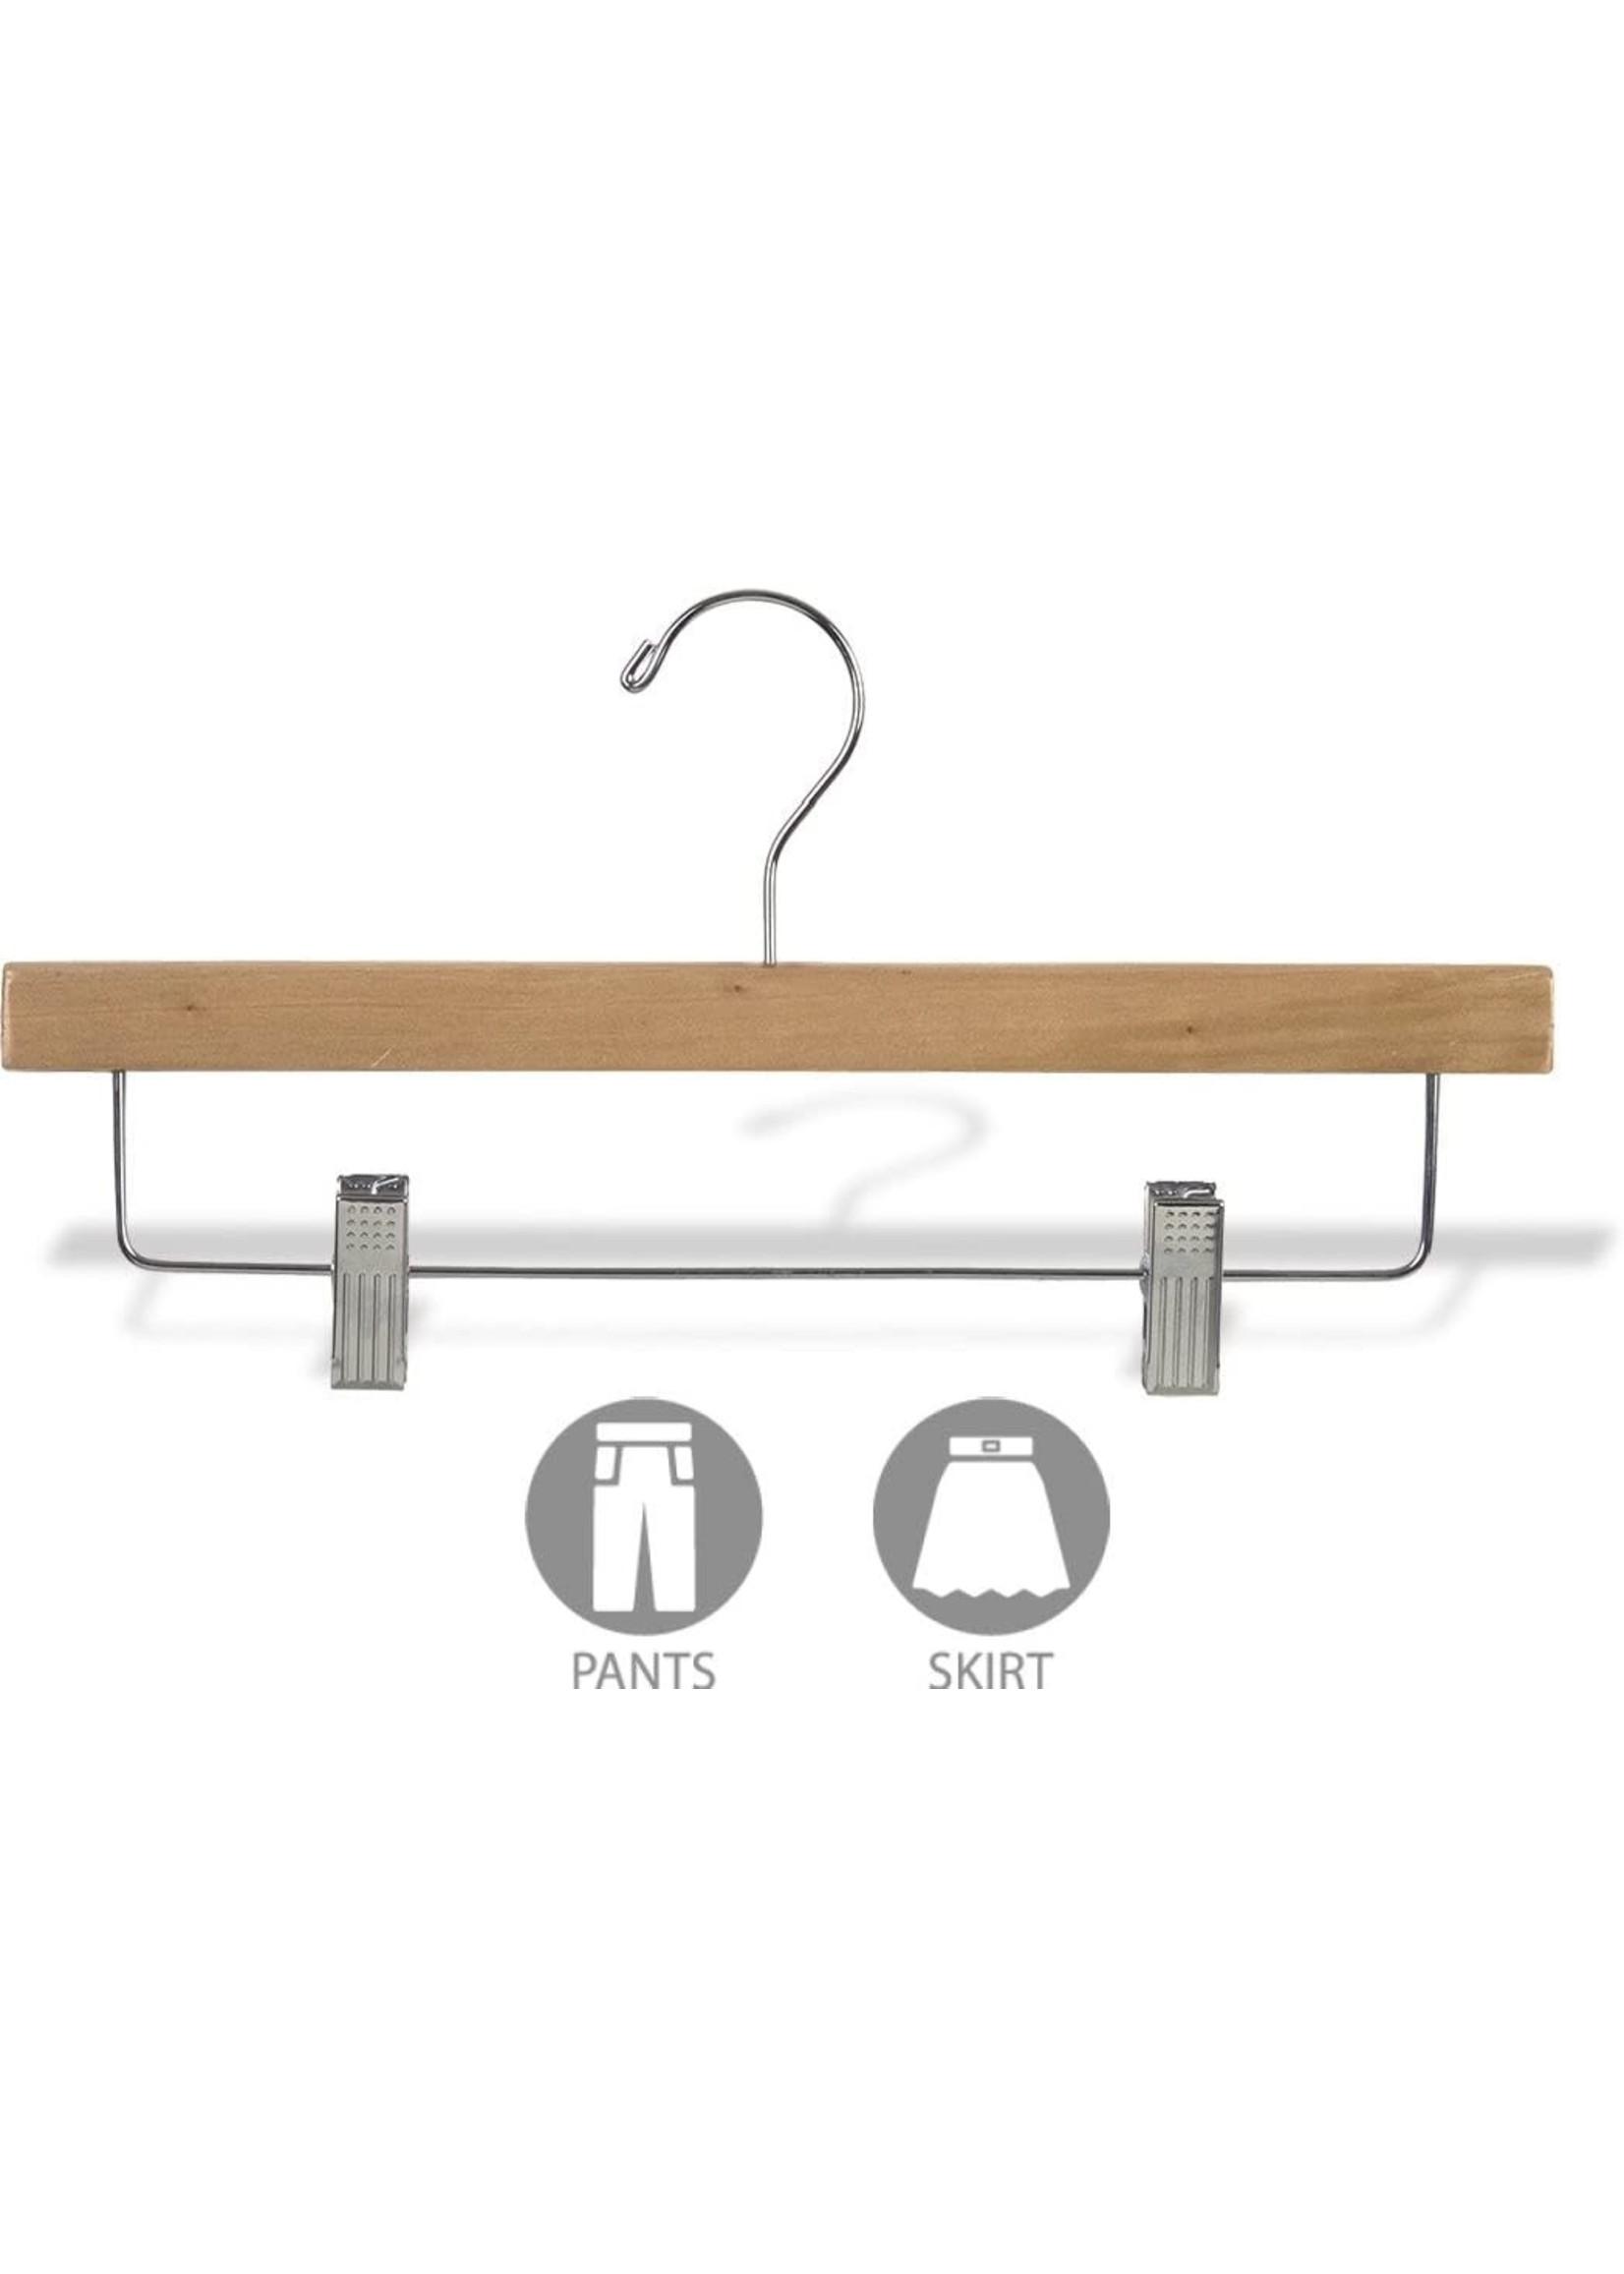 Sir Rat Wood Pant Hangers